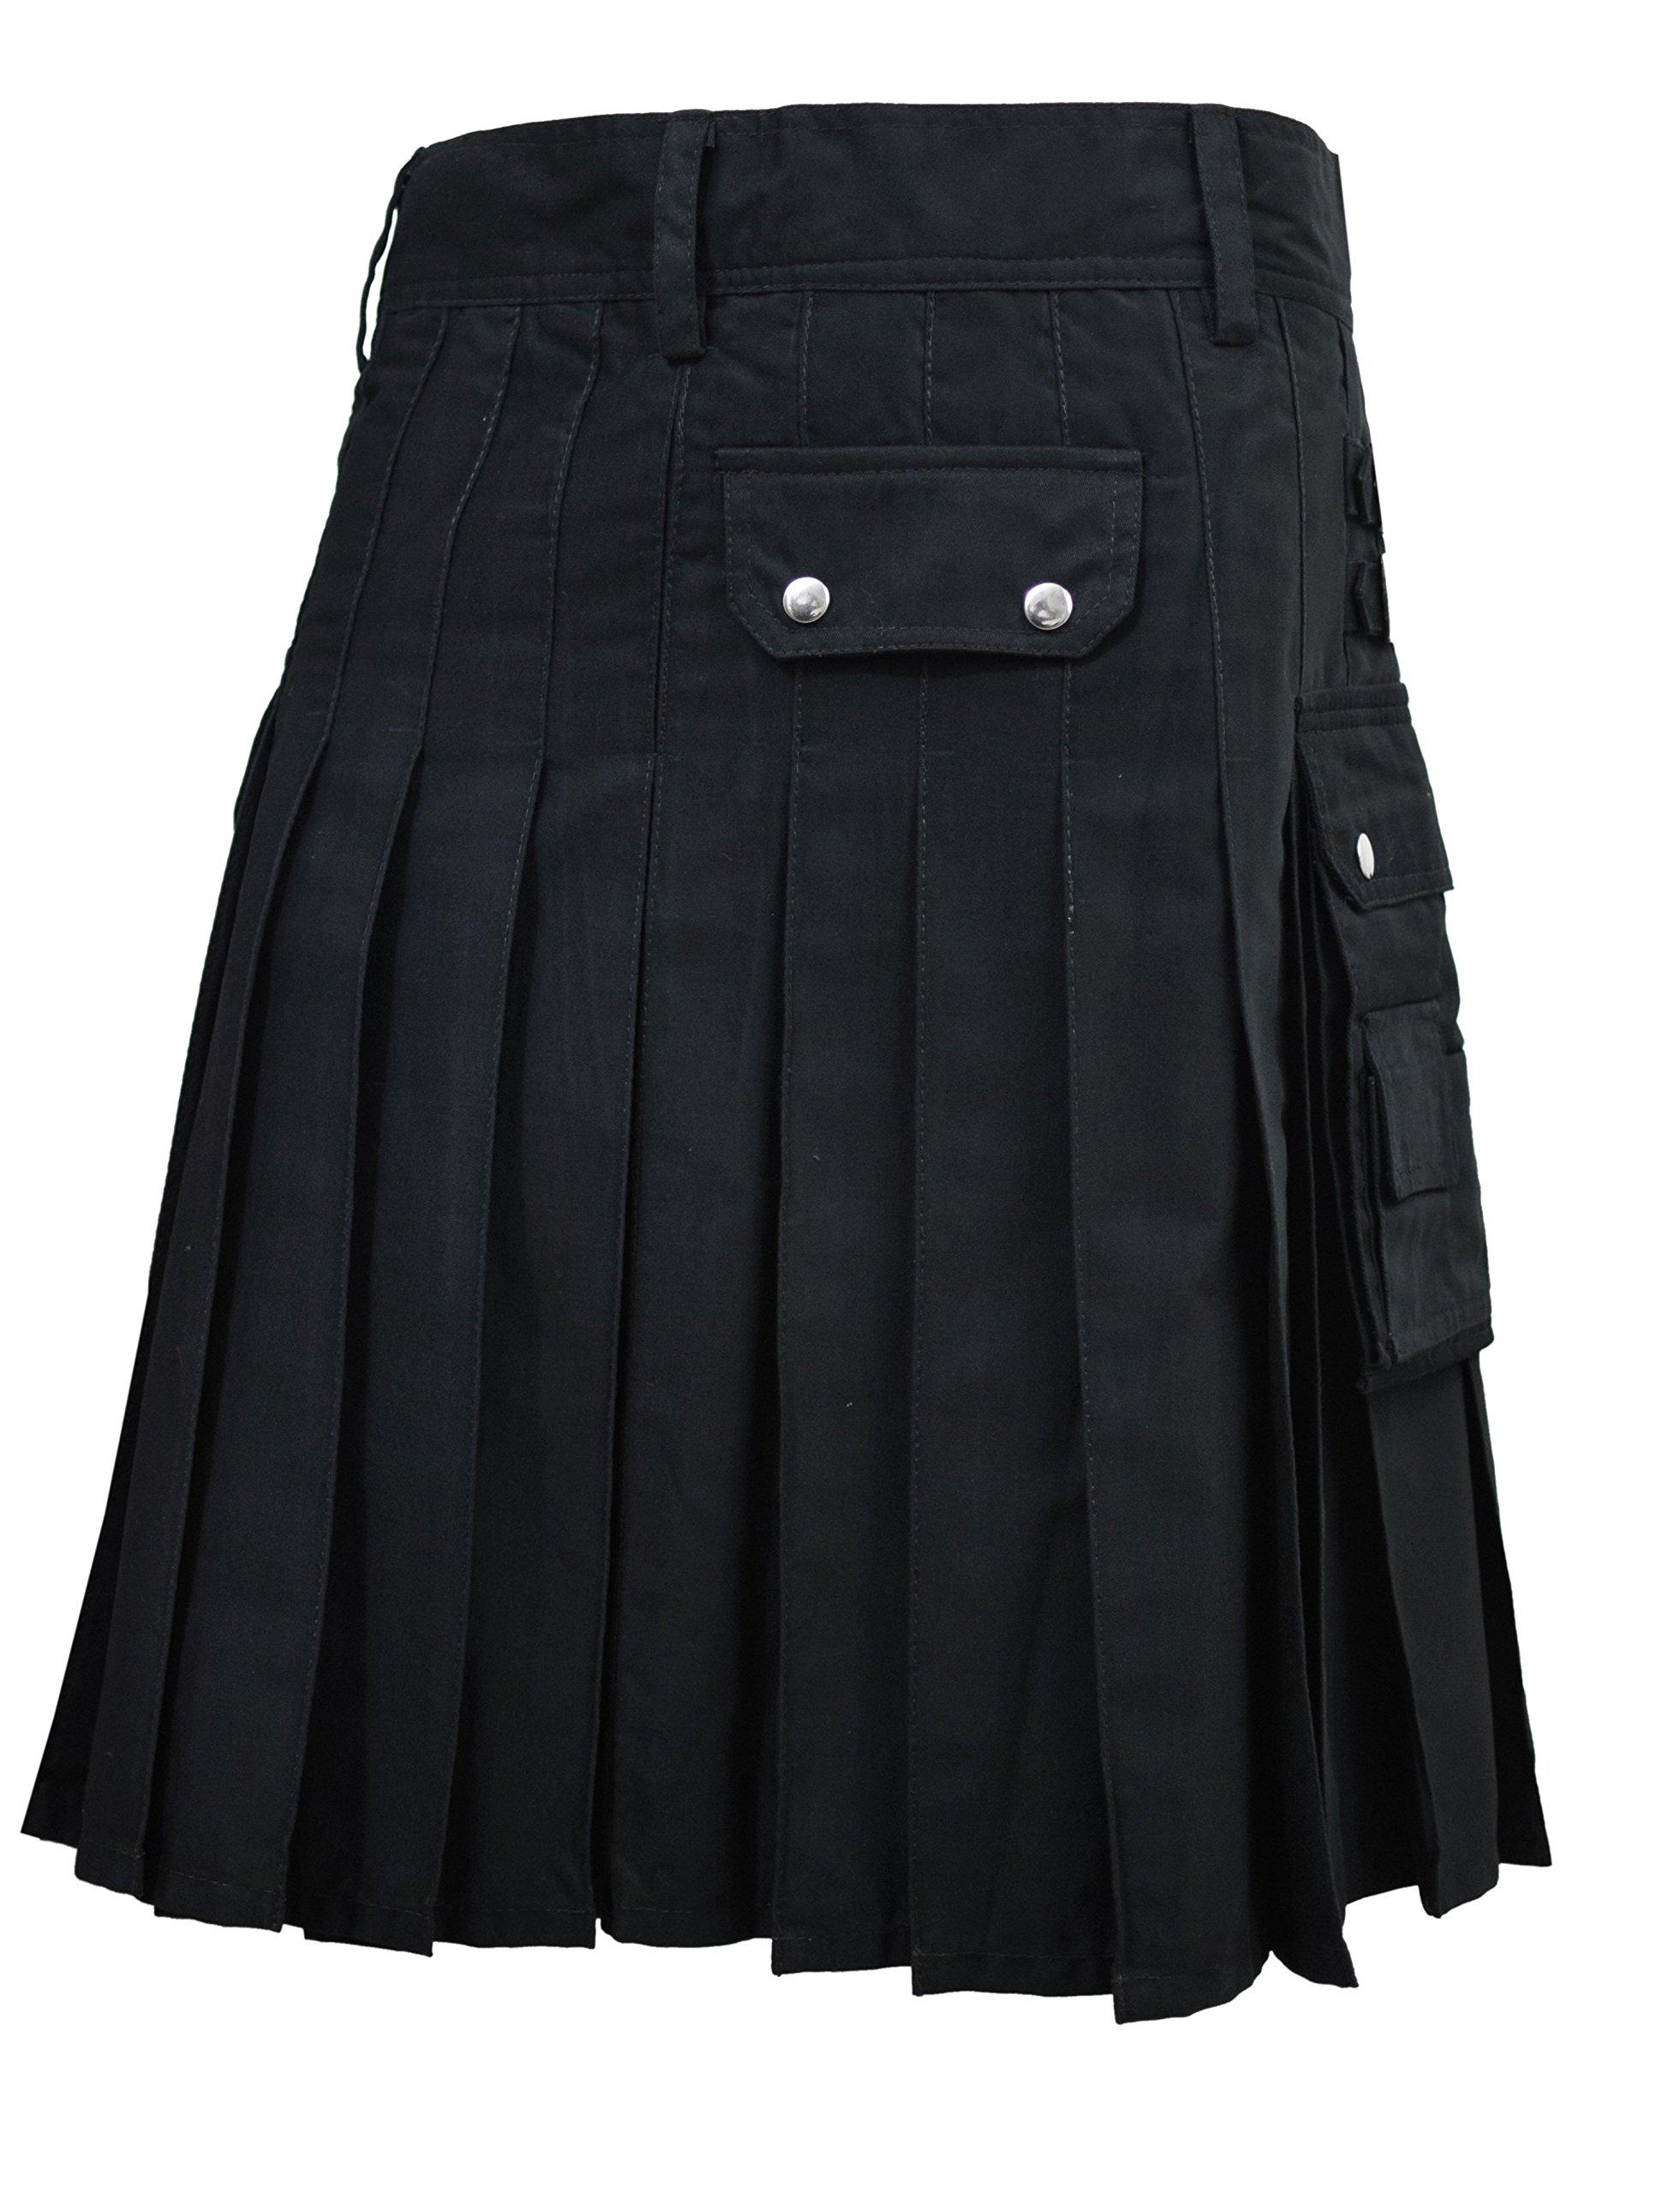 SHYNE Men's Black Fashion Sport Utility Kilt Deluxe Kilt Adjustable Sizes Pocket Kilt (38'') by SHYNE (Image #1)